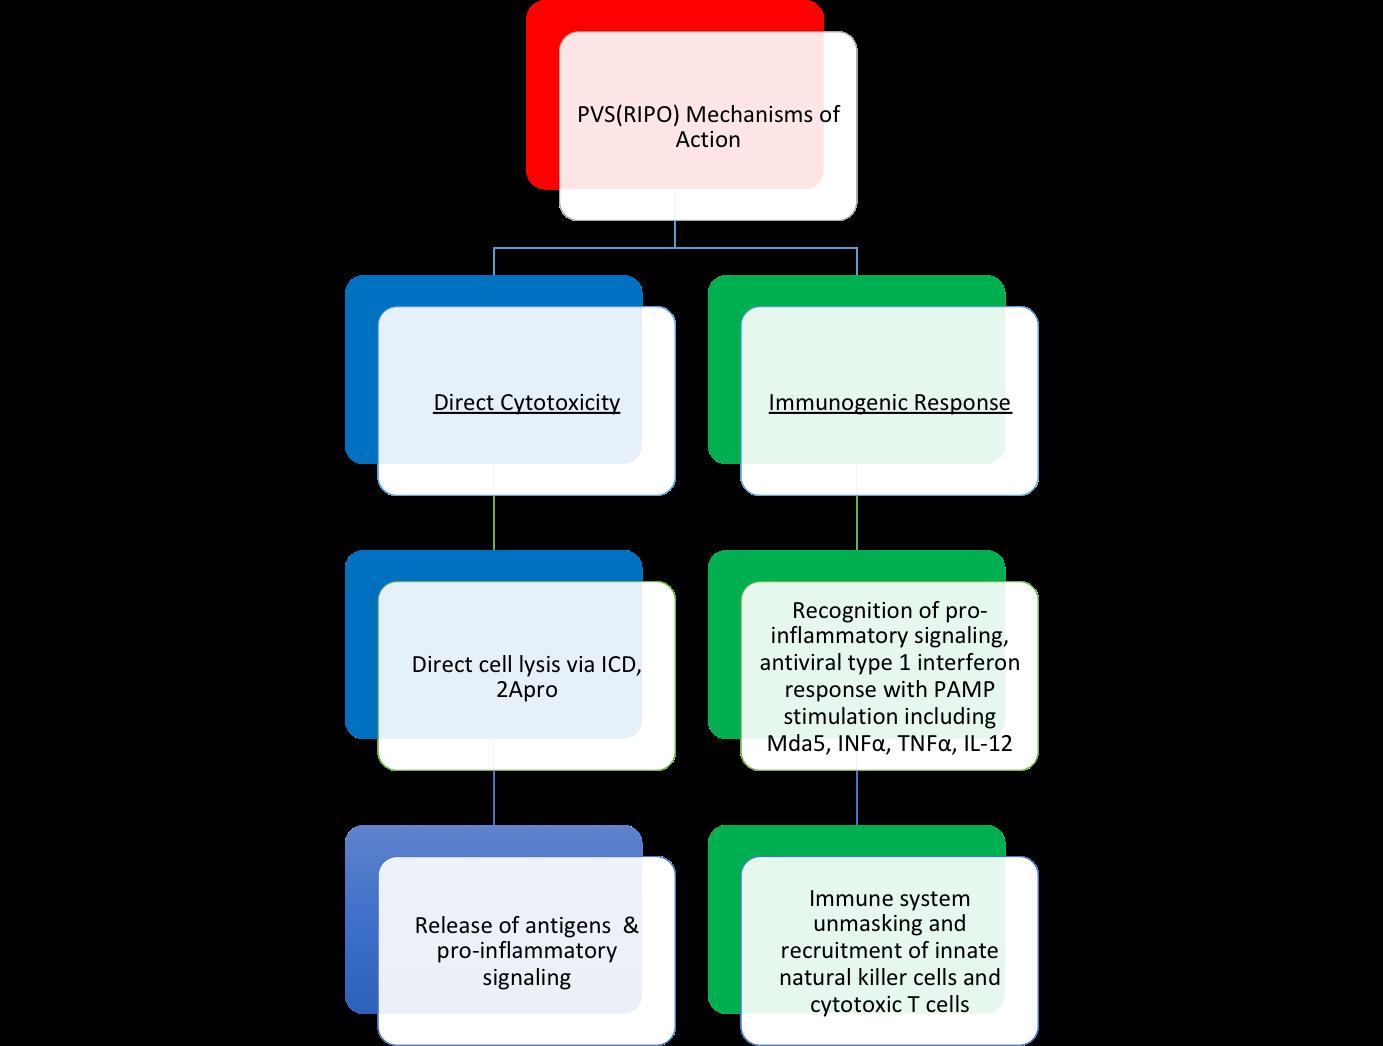 Recombinant Oncolytic Poliovirus for Glioblastoma: A Current